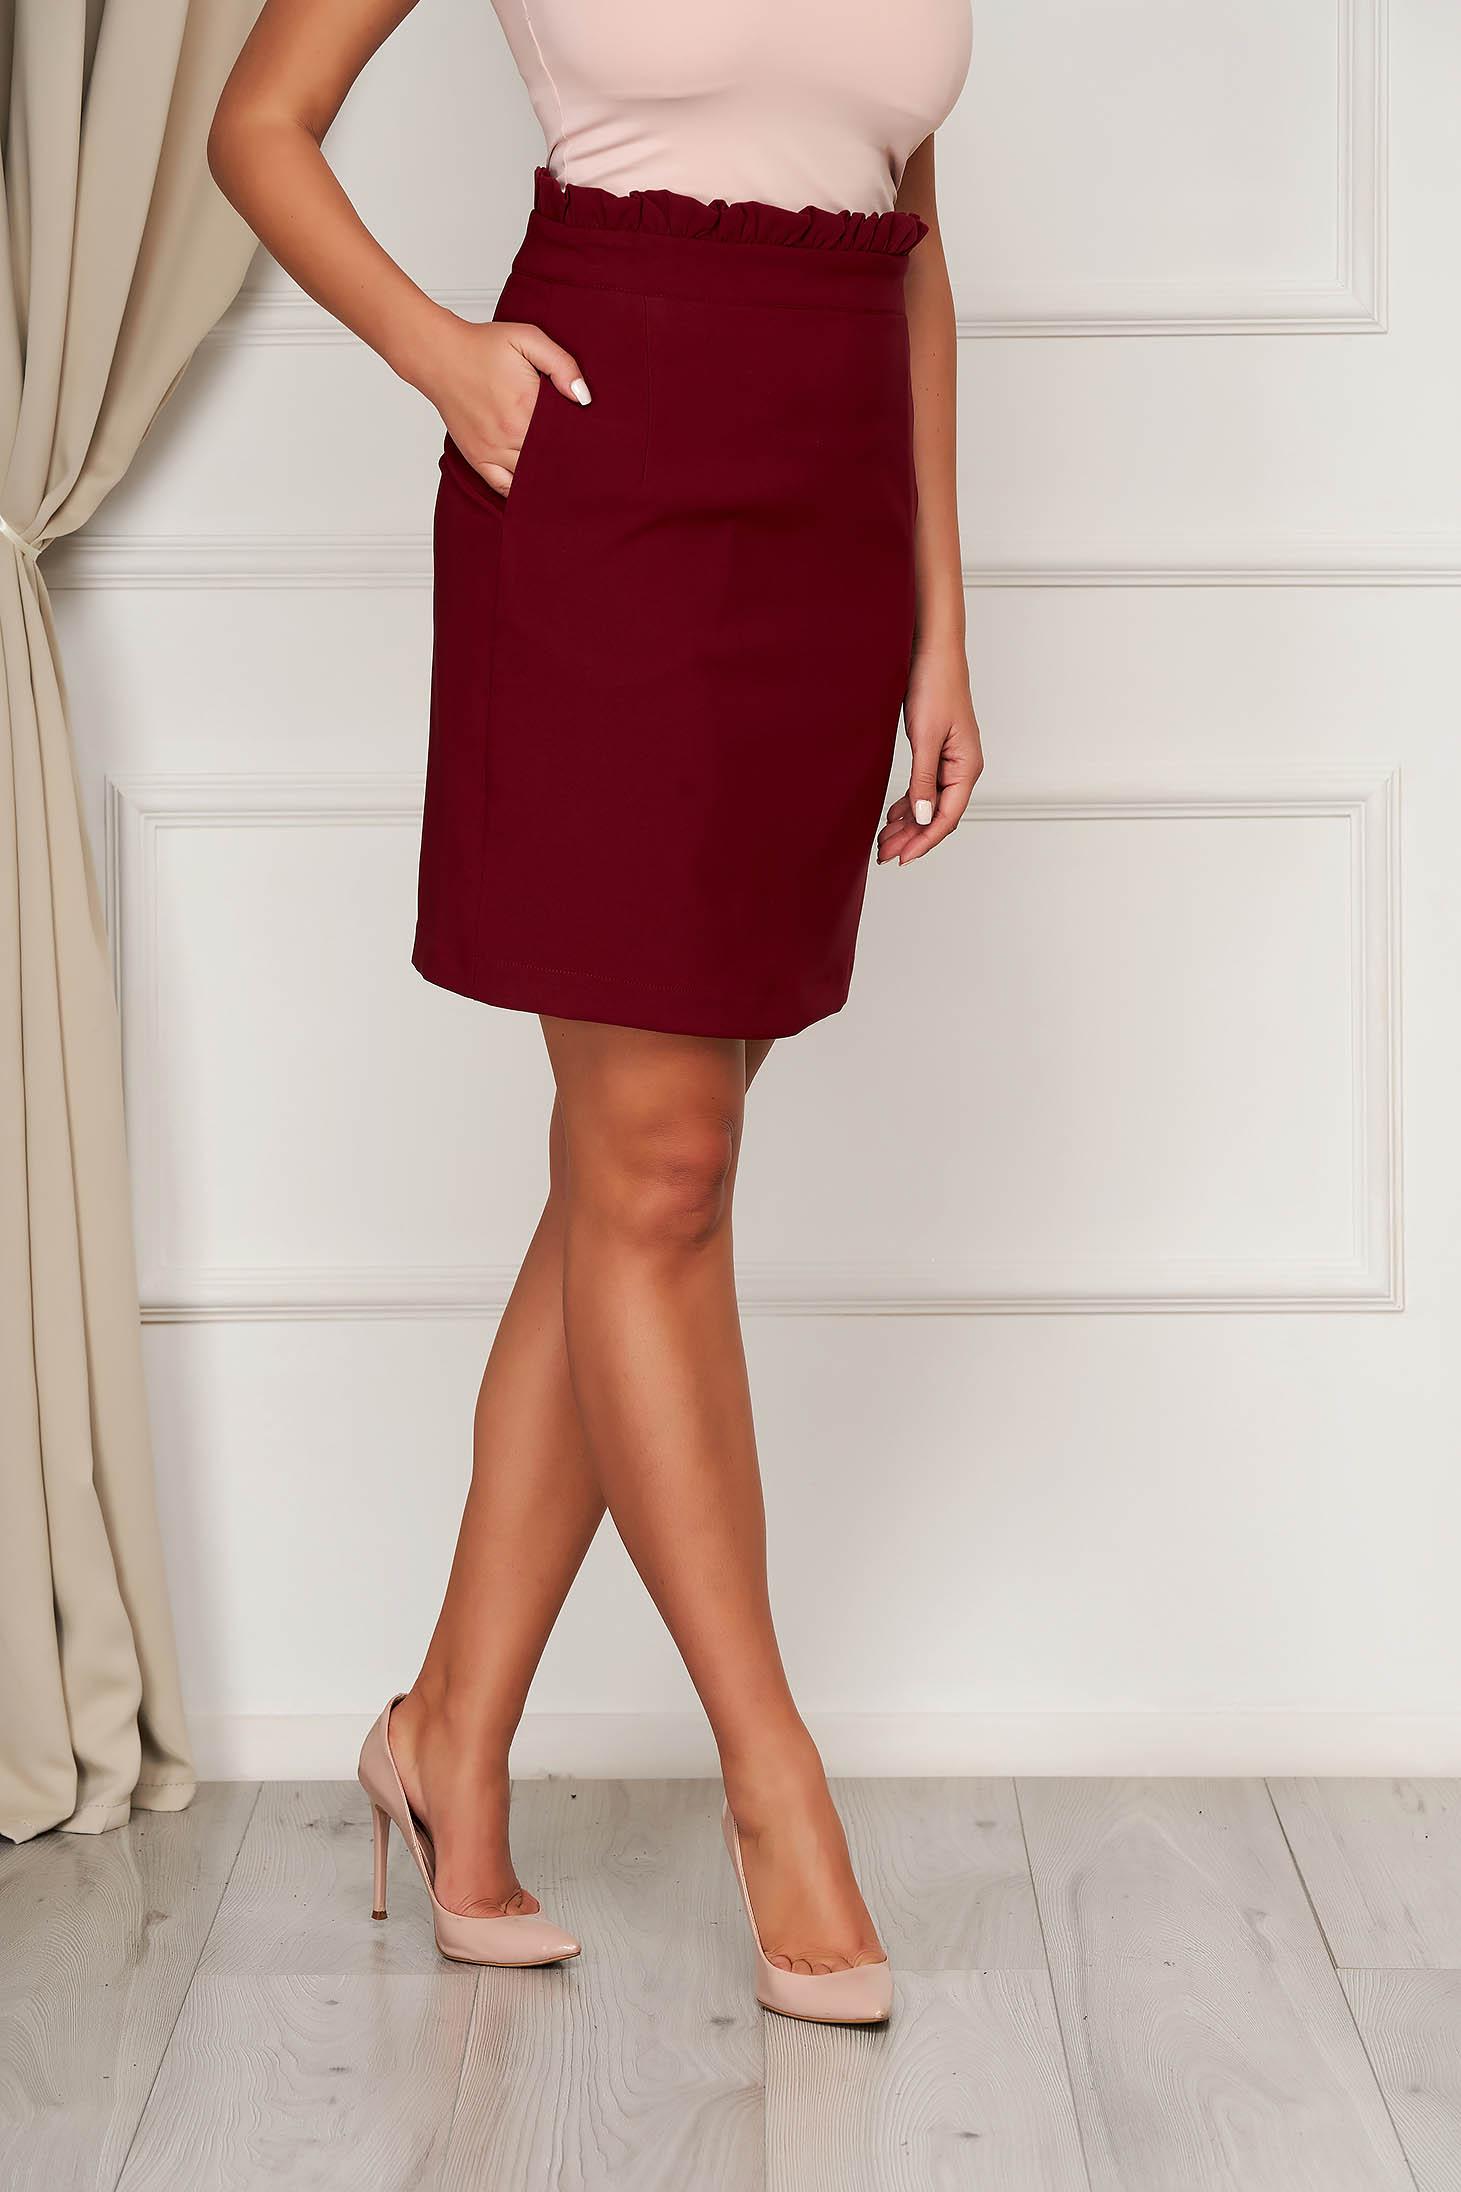 Burgundy skirt office short cut flared cloth from elastic fabric